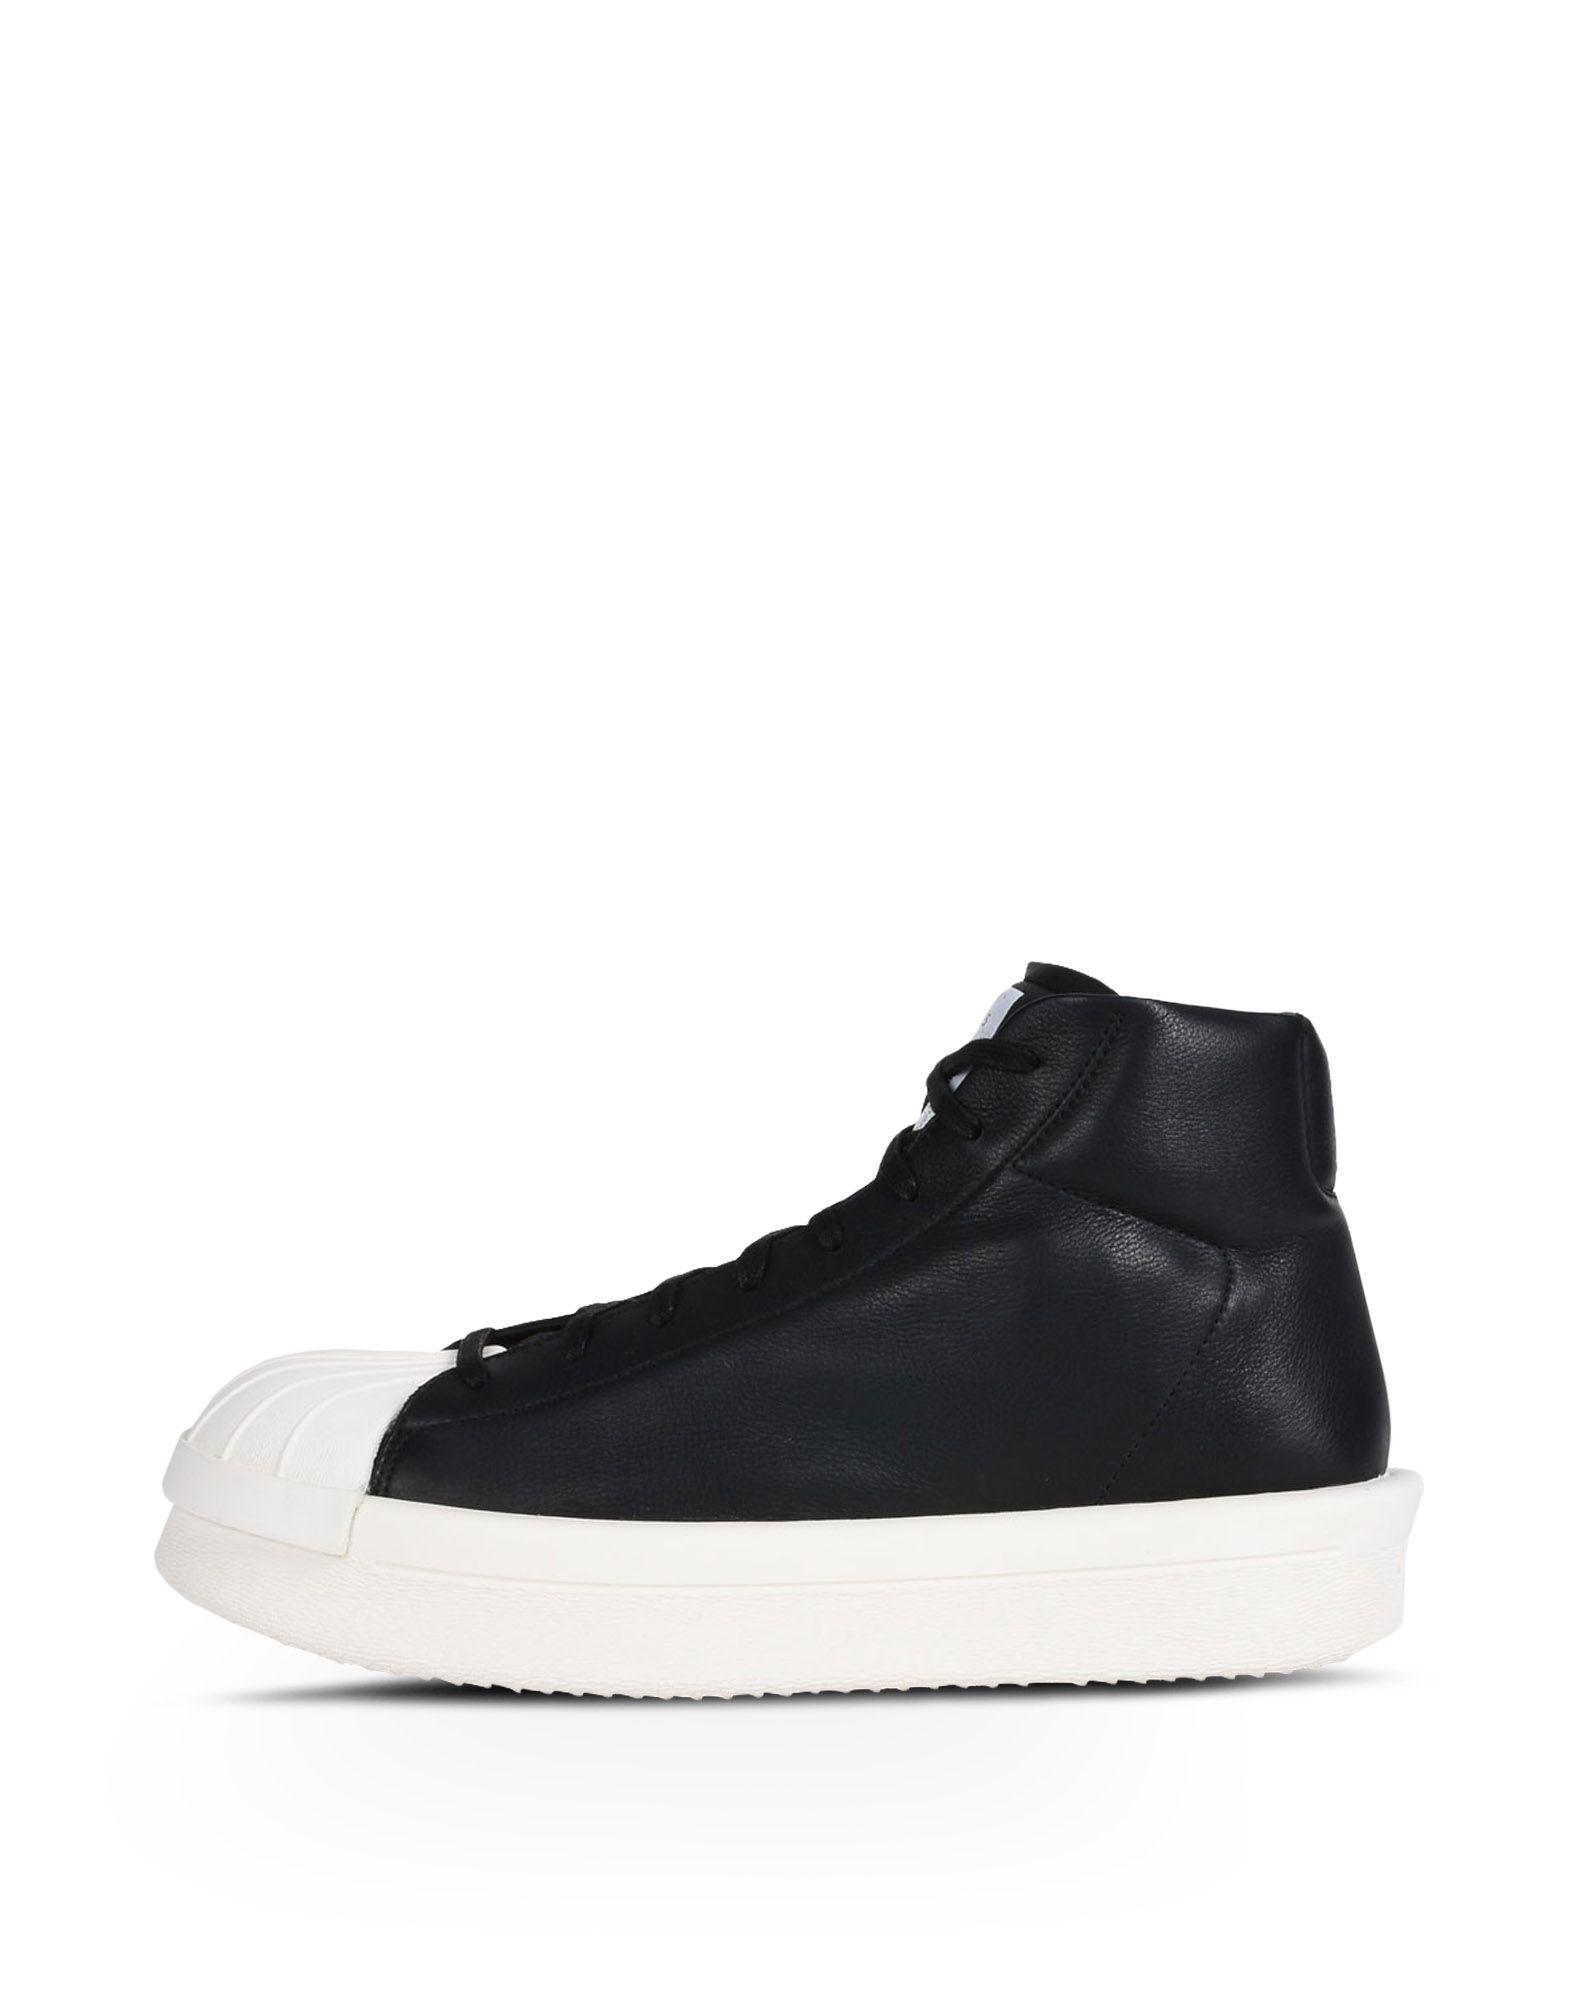 Adidas Par Rick Owens Baskets Mastodon - Noir R8pHFS